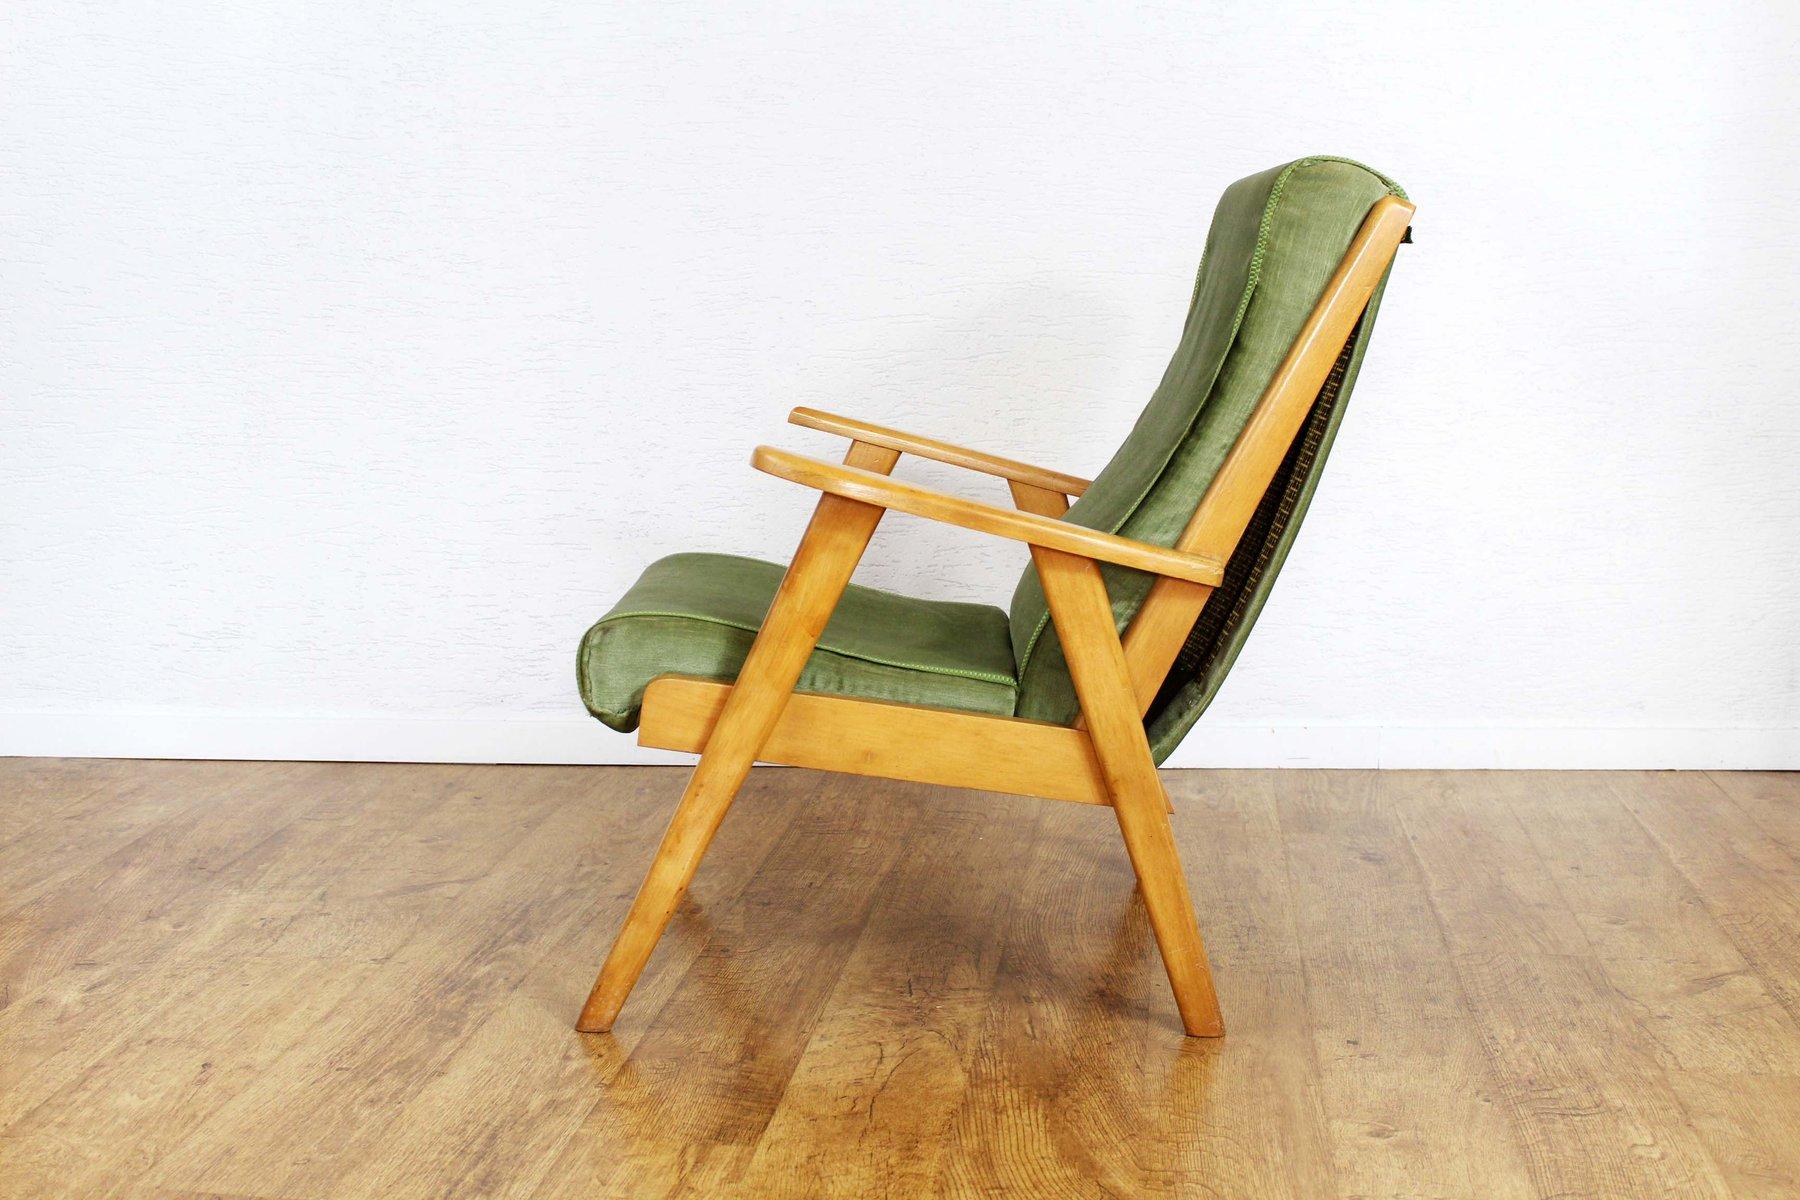 fauteuil scandinave mid century en vente sur pamono. Black Bedroom Furniture Sets. Home Design Ideas